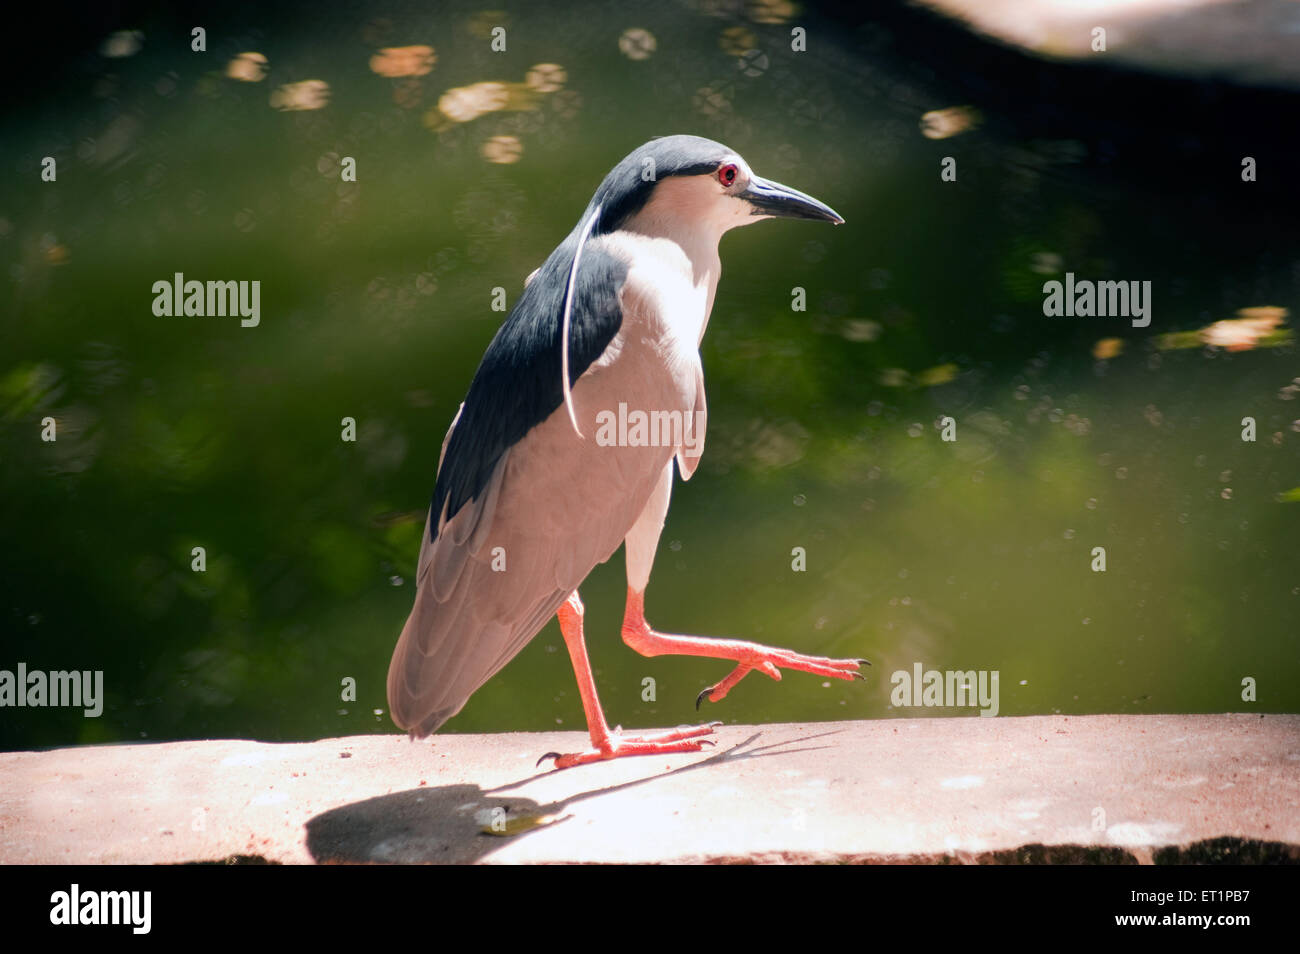 Vögel; Nachtreiher Nycticorax nycticorax Stockbild